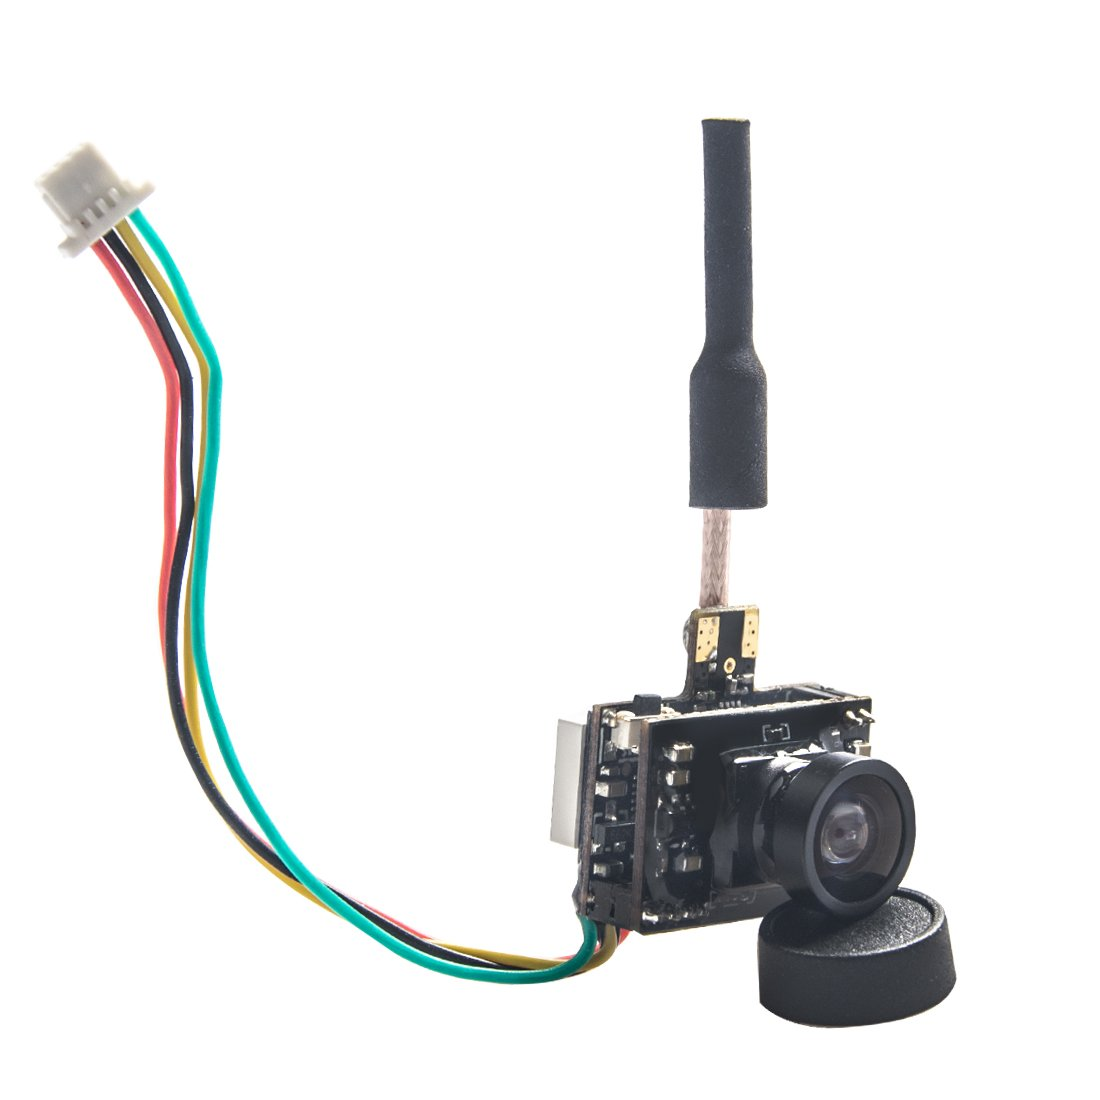 Transmisor Wolfwhoop P-1 Micro 5.8ghz 25mw / 50mw / 200mw Fpv Y Camara 600tvl Aio Con Interfaz Osd Para Fpv Quadcopter D